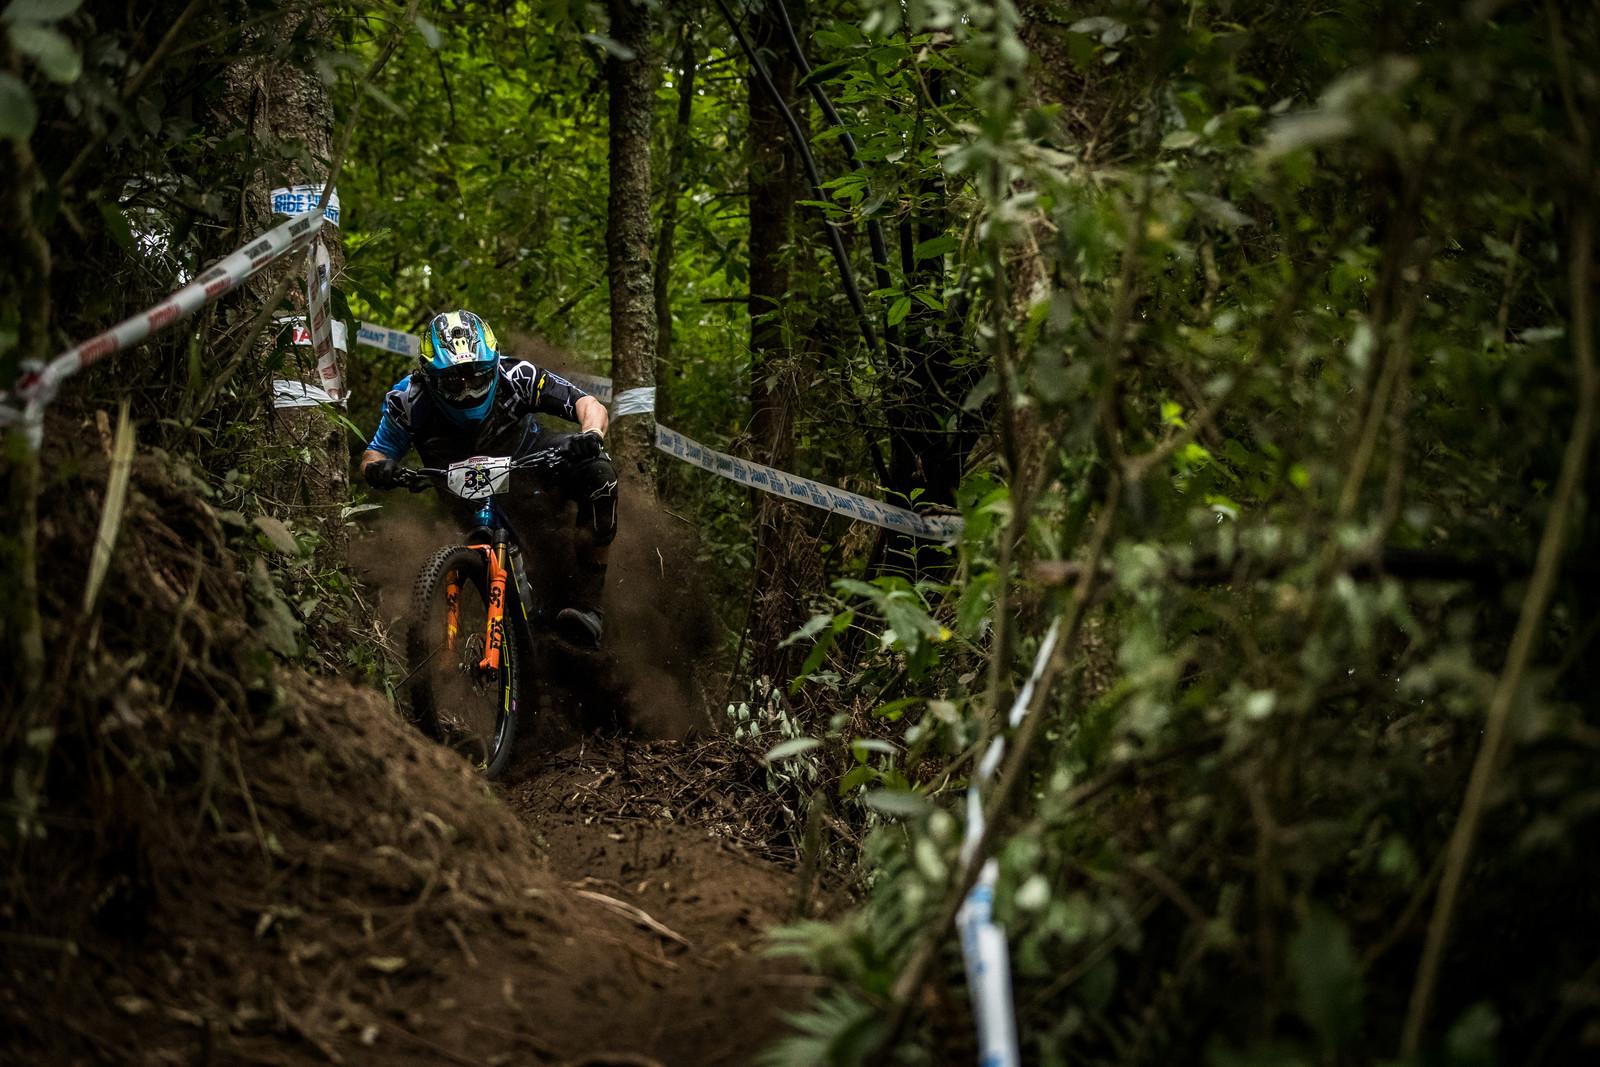 Wyn Masters - 2019 Enduro World Series Crankworx Rotorua - Mountain Biking Pictures - Vital MTB